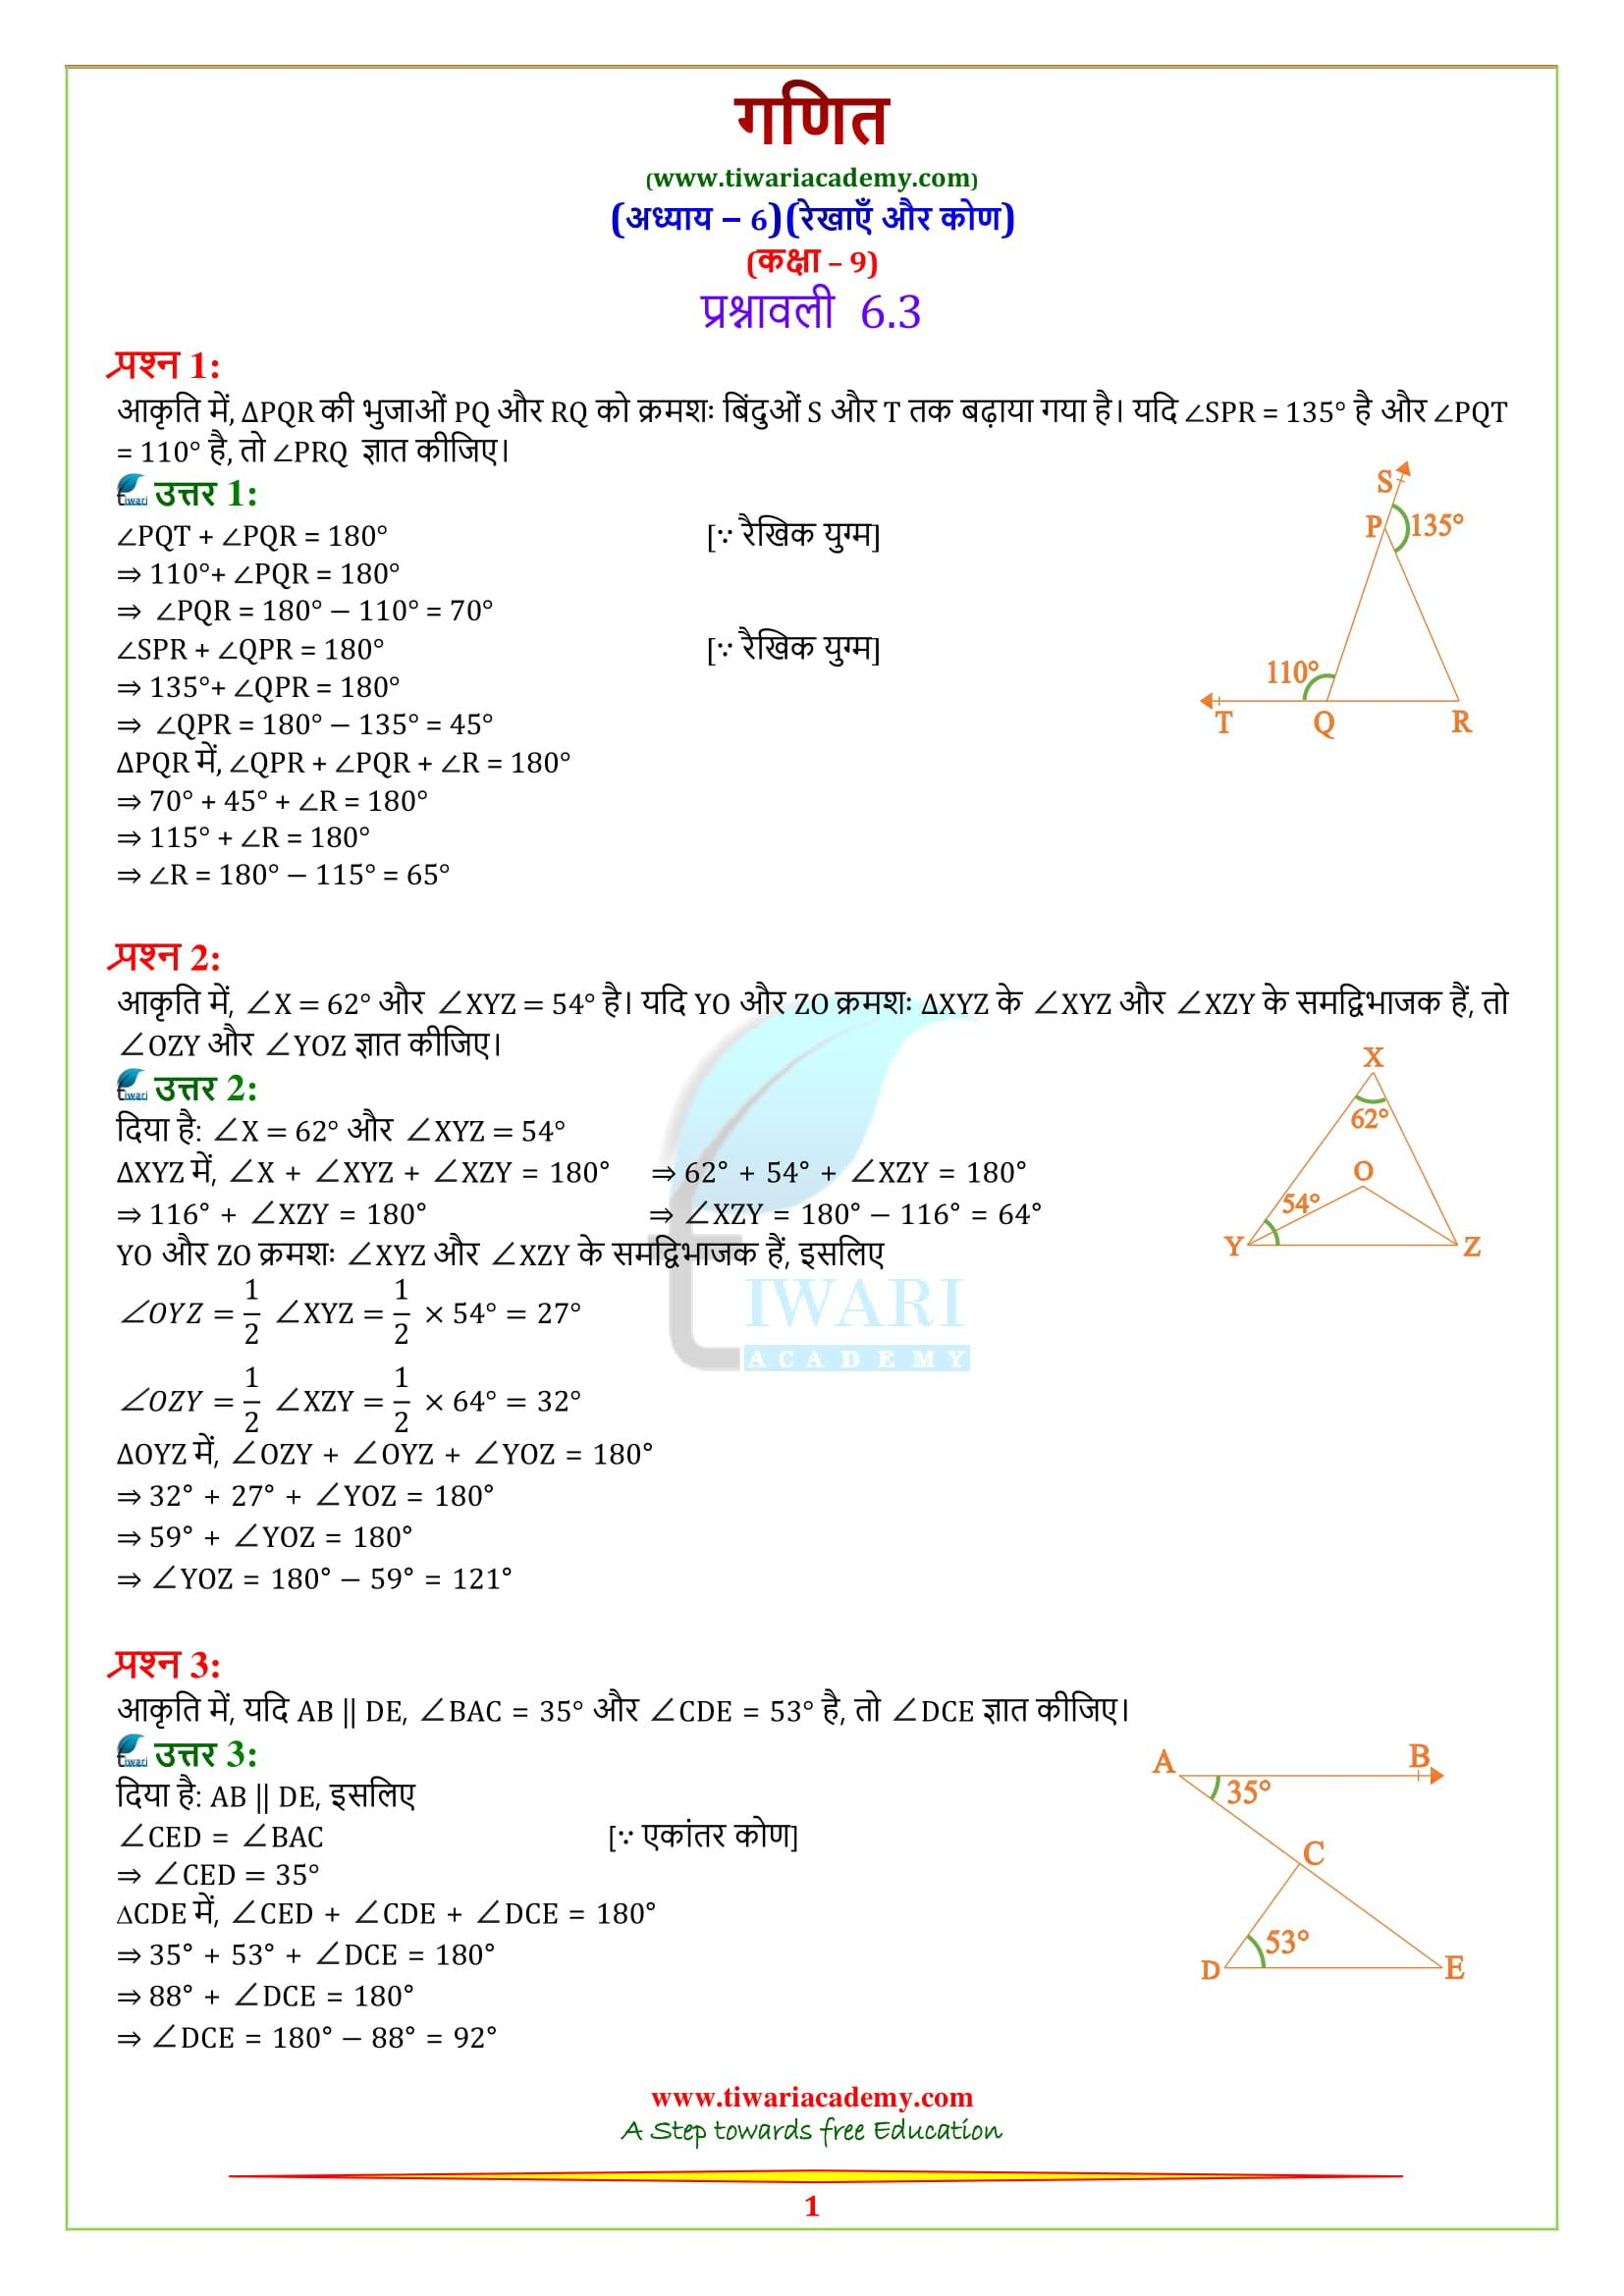 CBSE NCERT Solutions for Class 9 Maths in English Medium